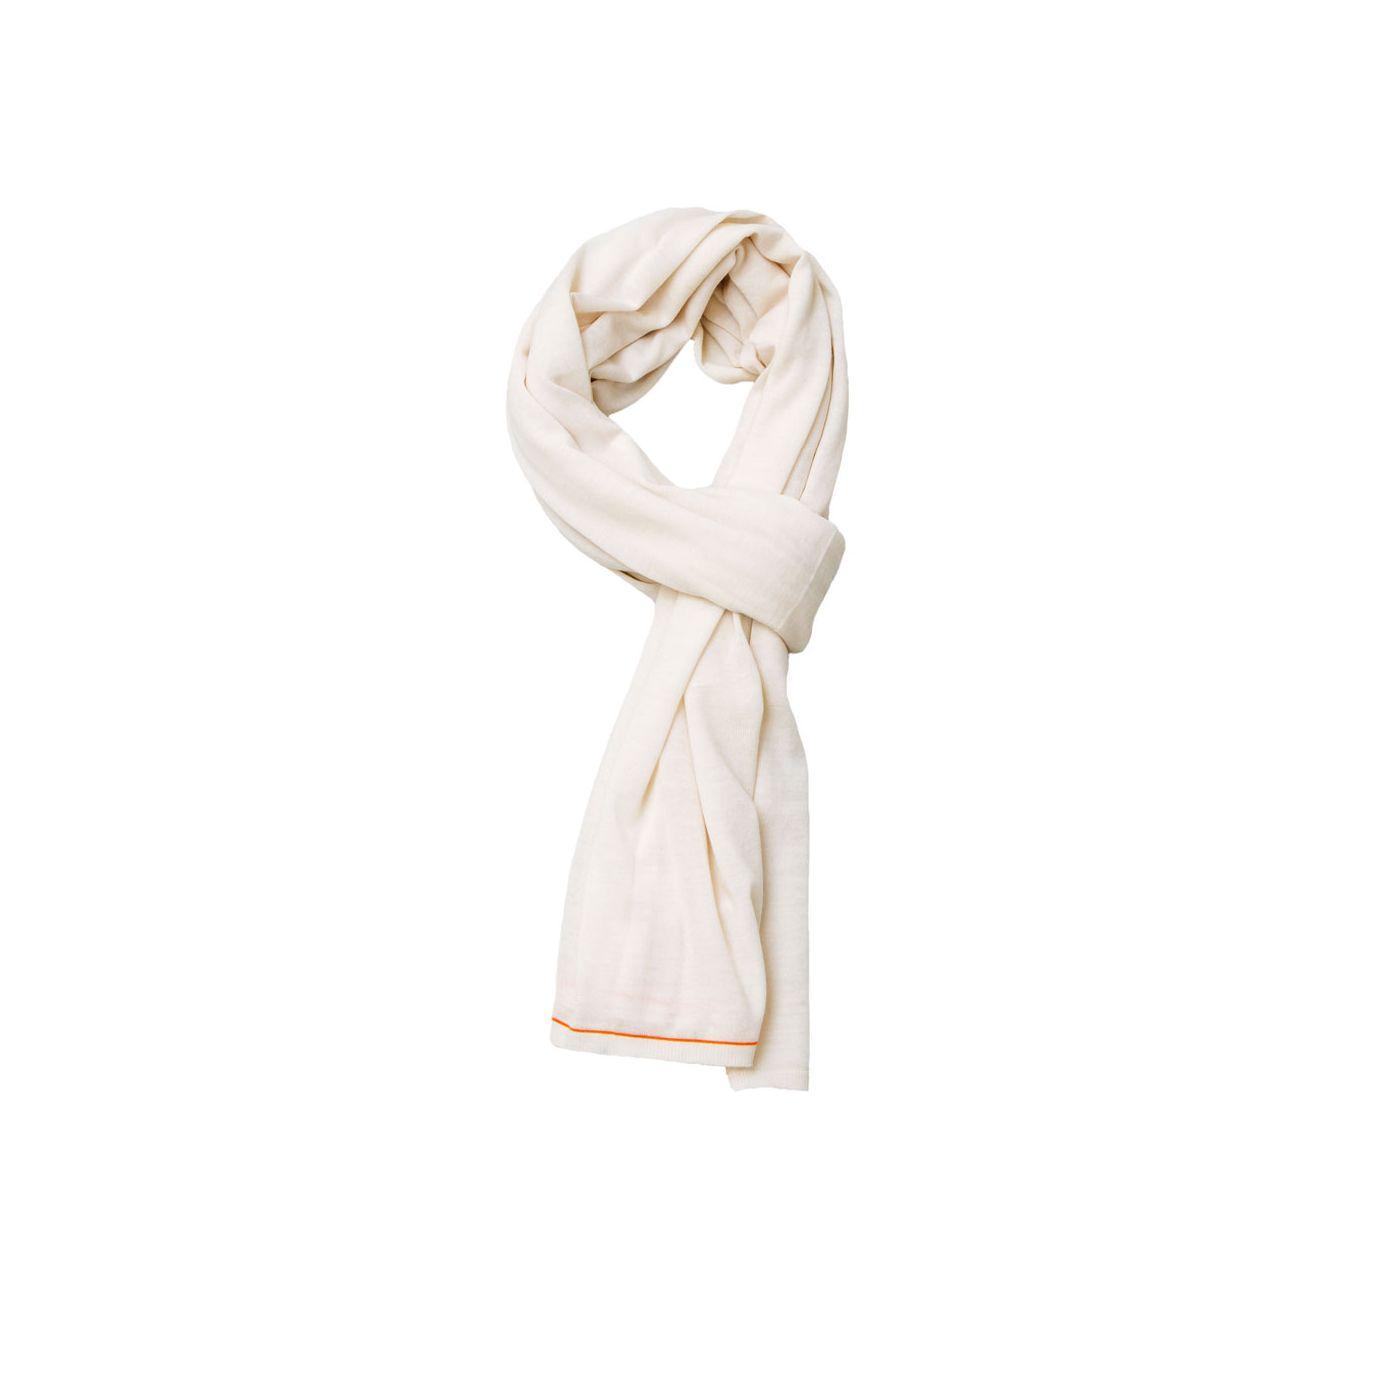 Scarf for men made of Merino wool in White